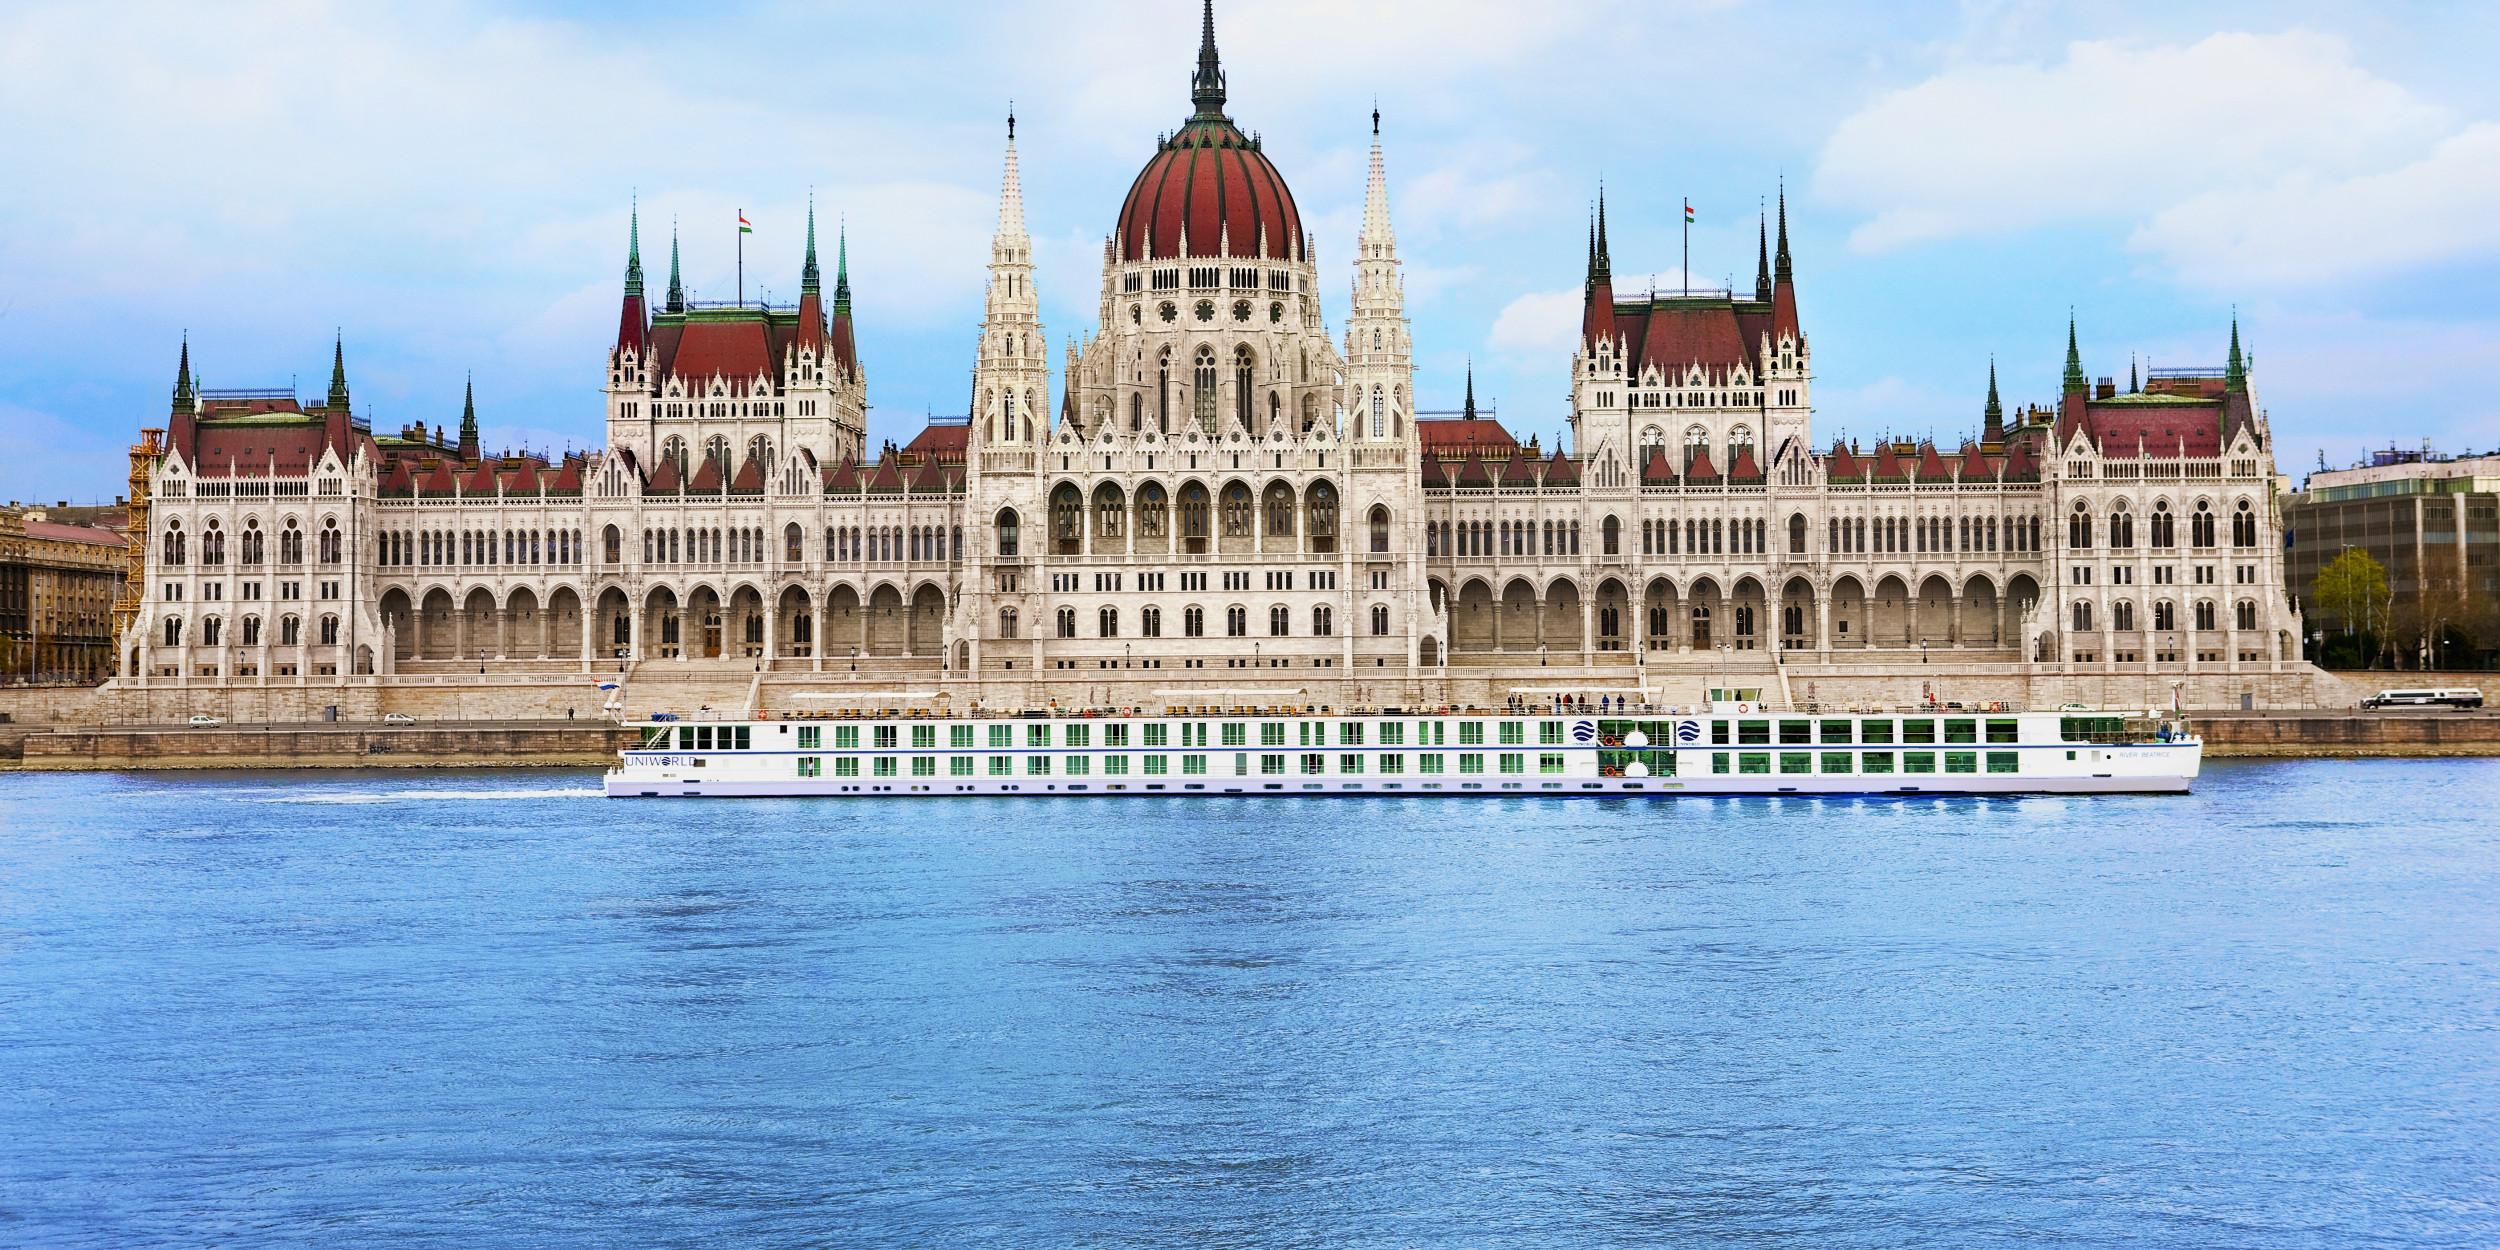 Uniworld-River-Beatrice-Budapest-37741-e1407968459119-2500x1250.jpg